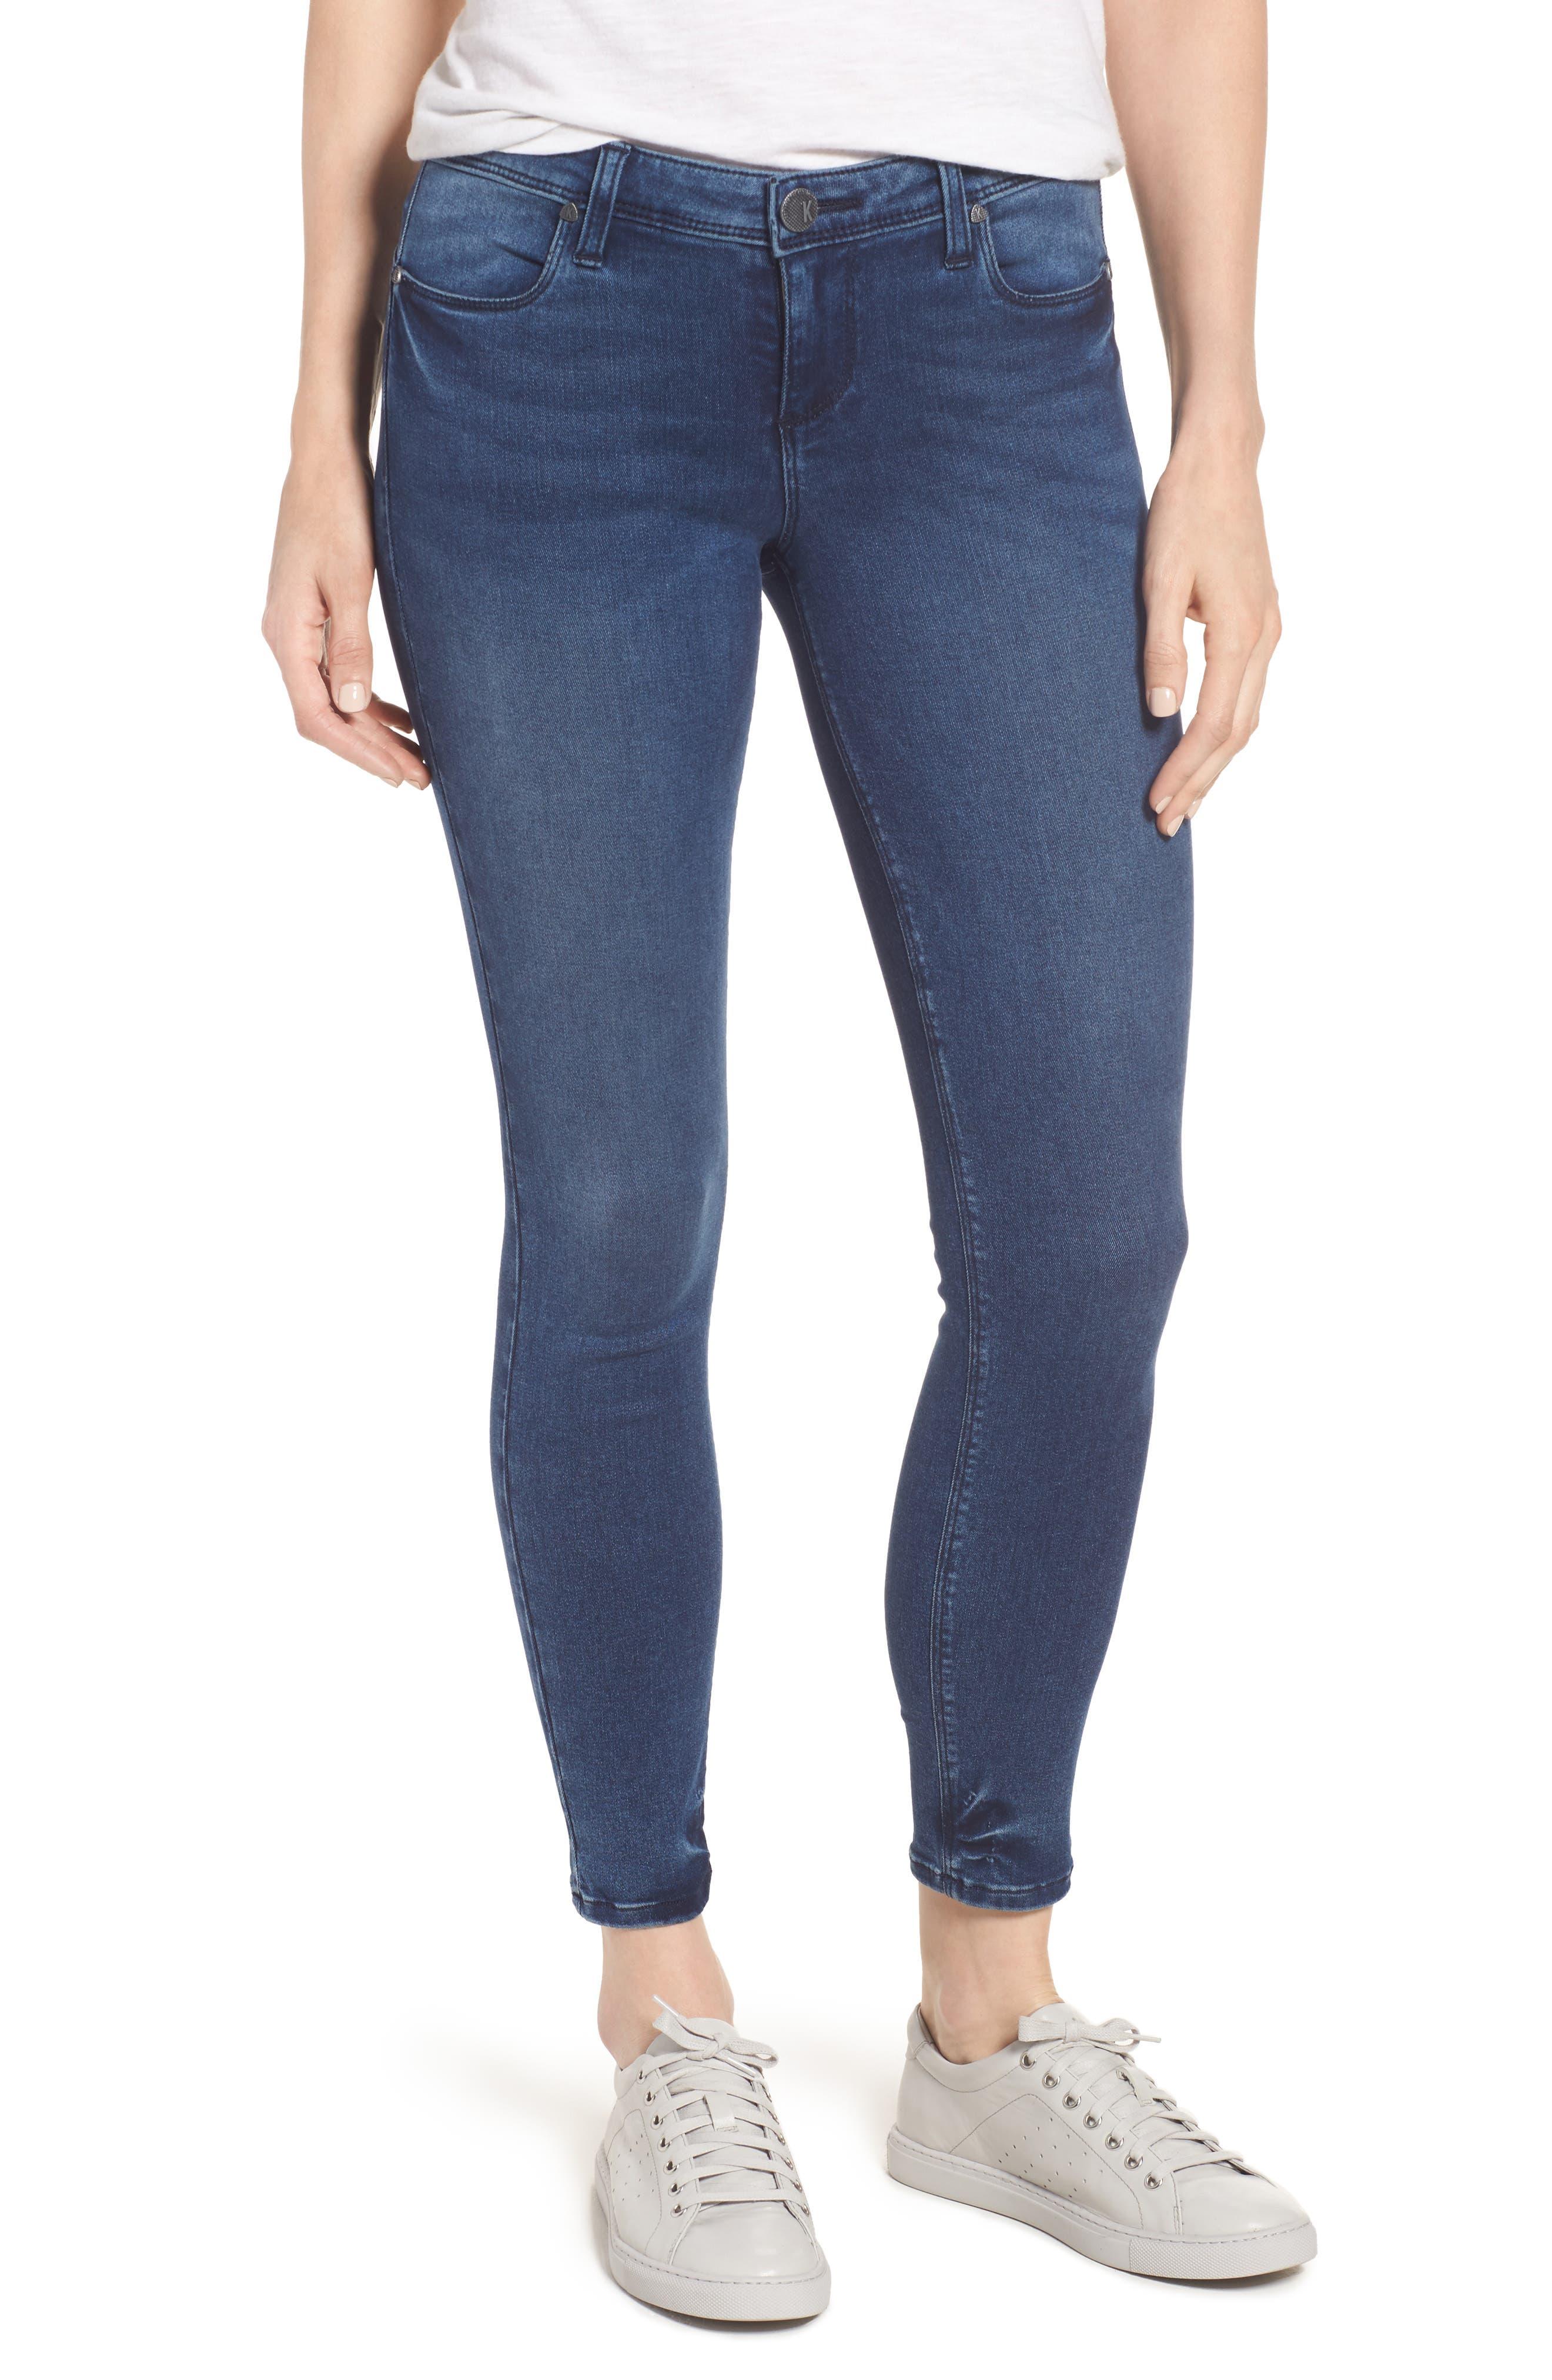 Alternate Image 1 Selected - KUT from the Kloth Jennifer Ultra Skinny Jeans (Fashionable)